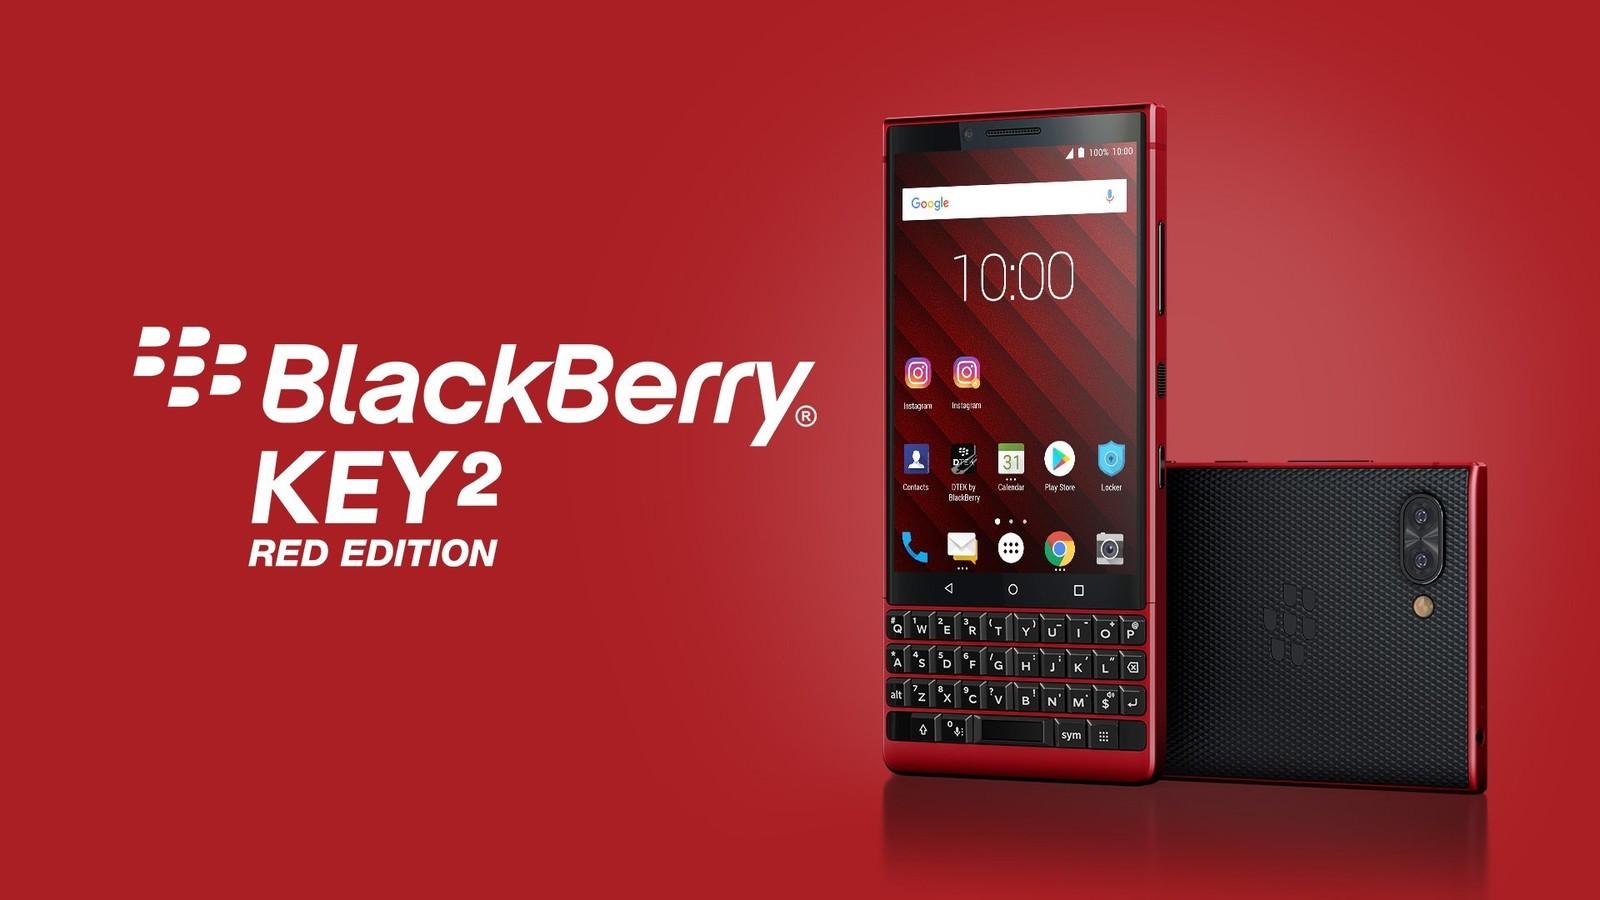 key2-red-edition.jpg